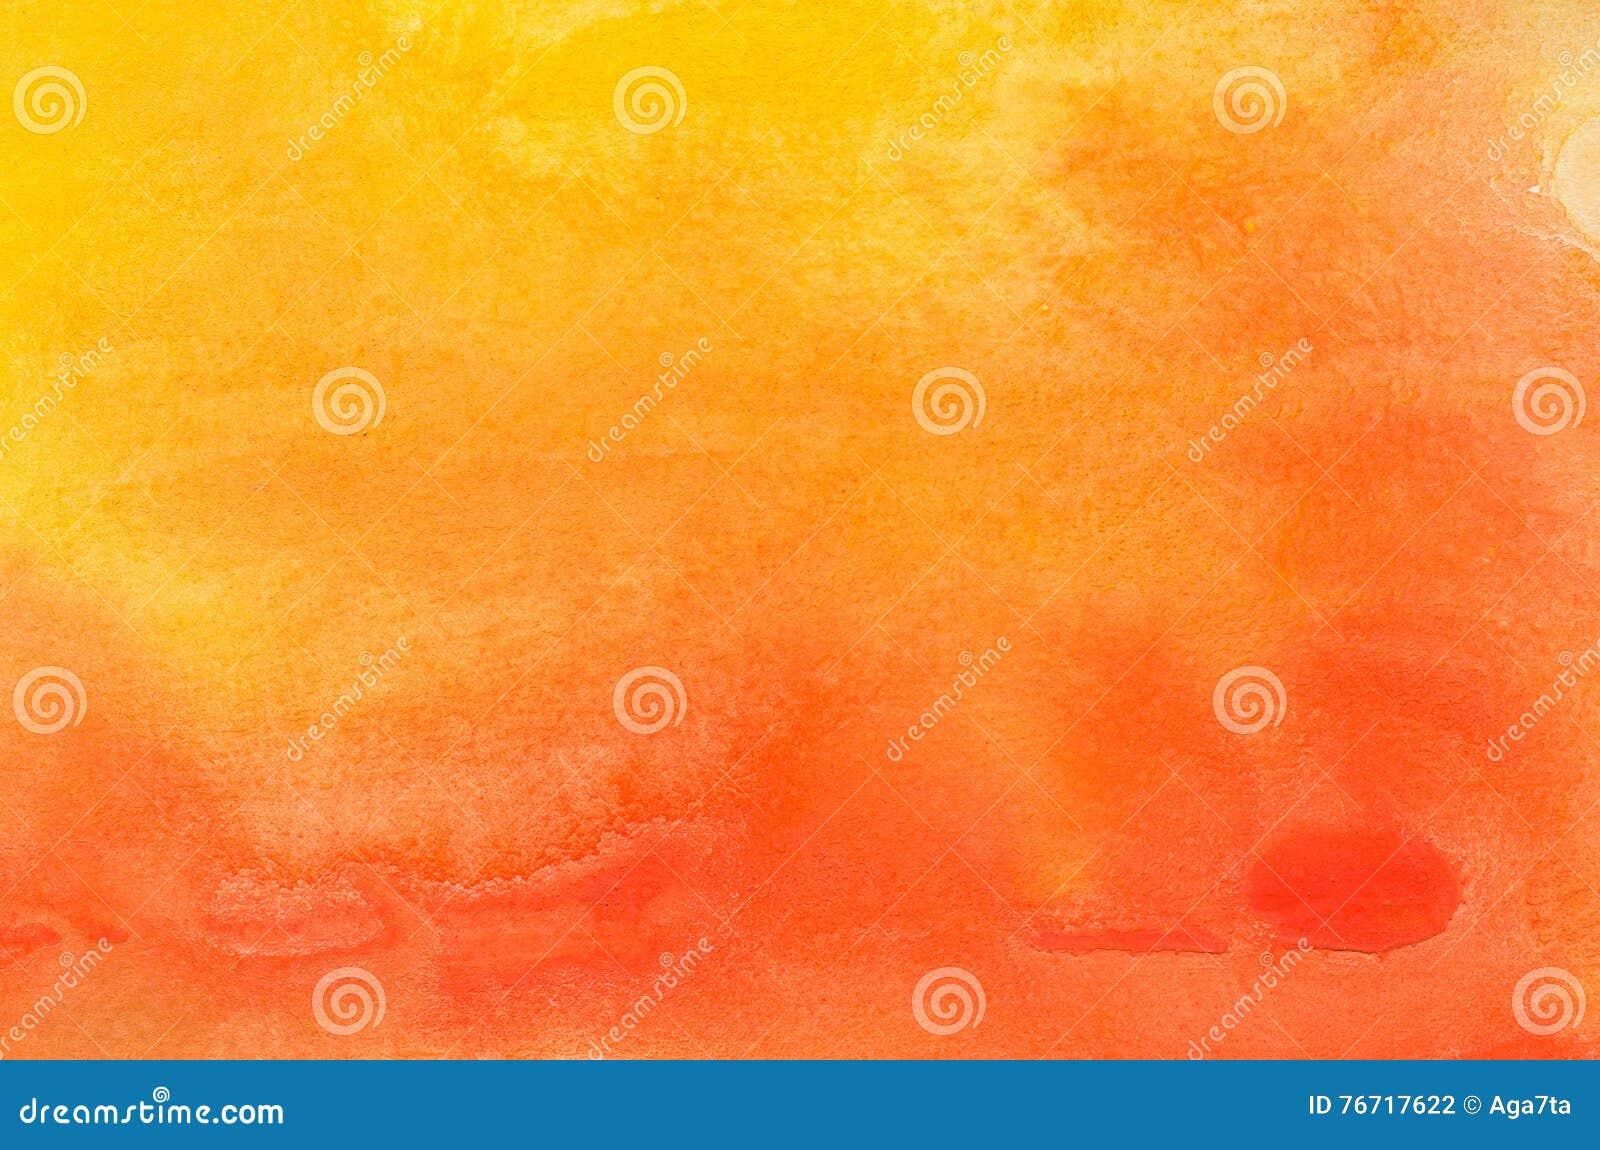 Oranje waterverf geschilderde textuur als achtergrond